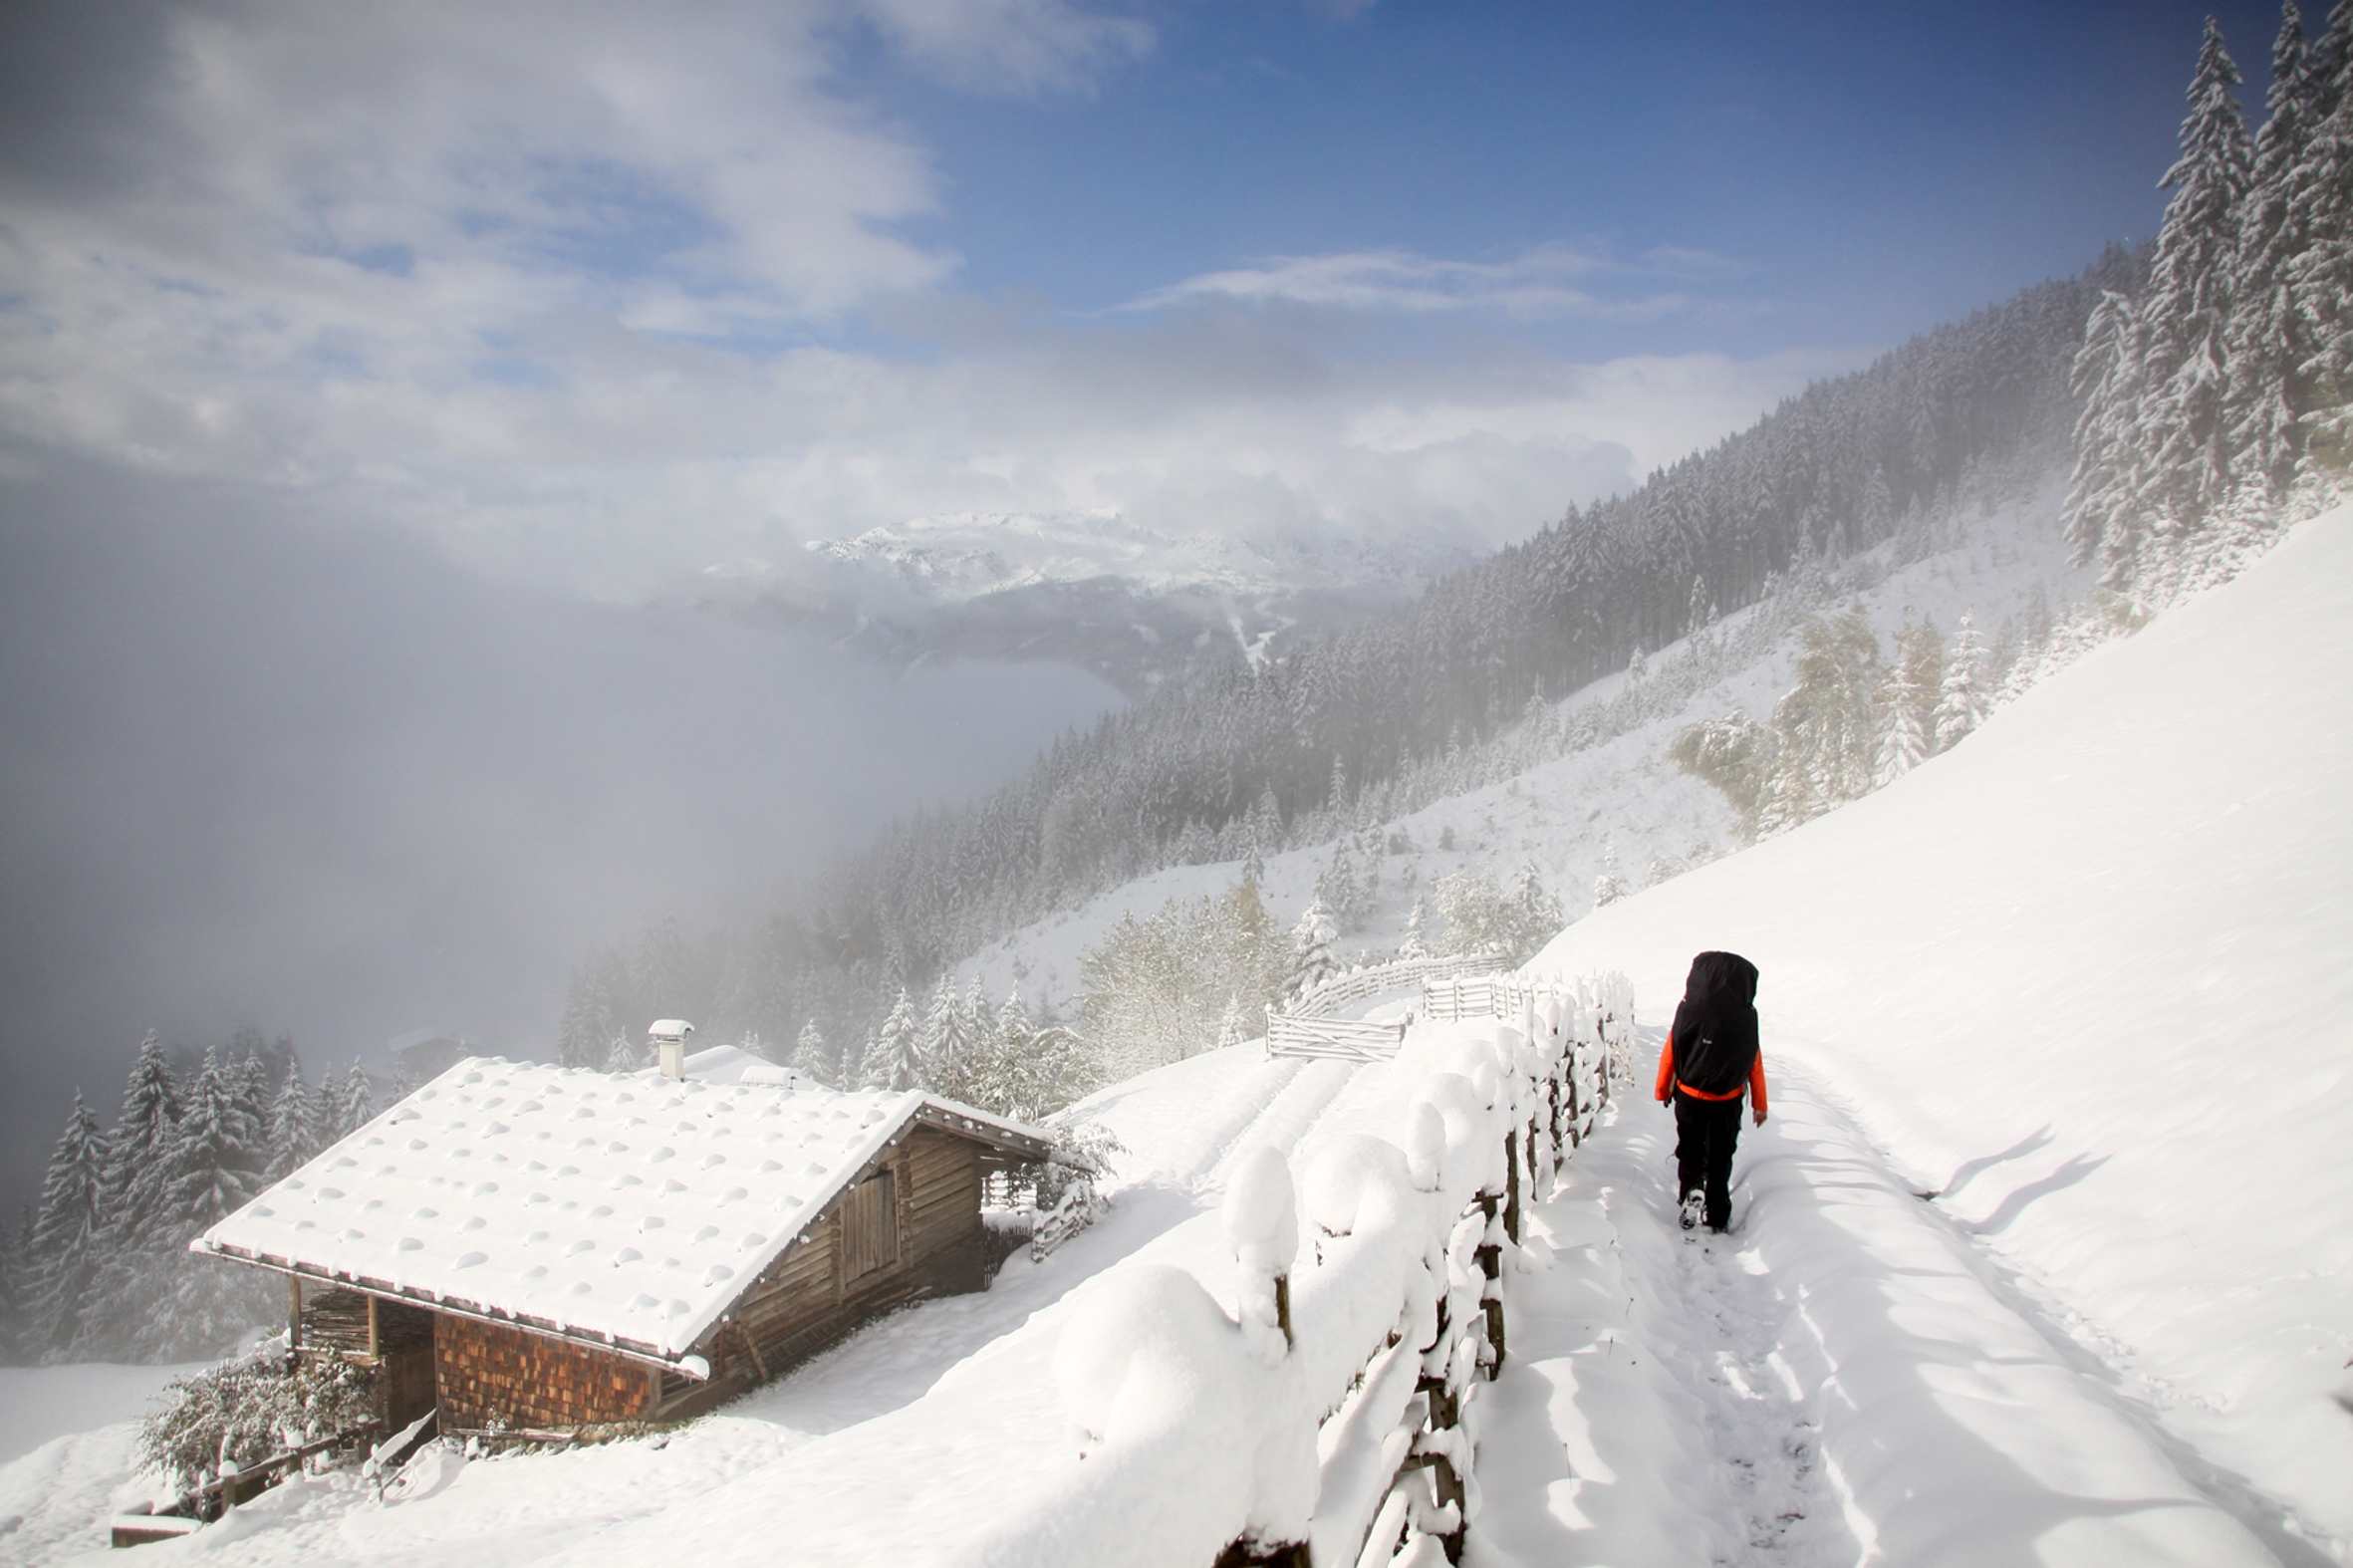 Winter-Tour Unterwegs Outdoor-Experten